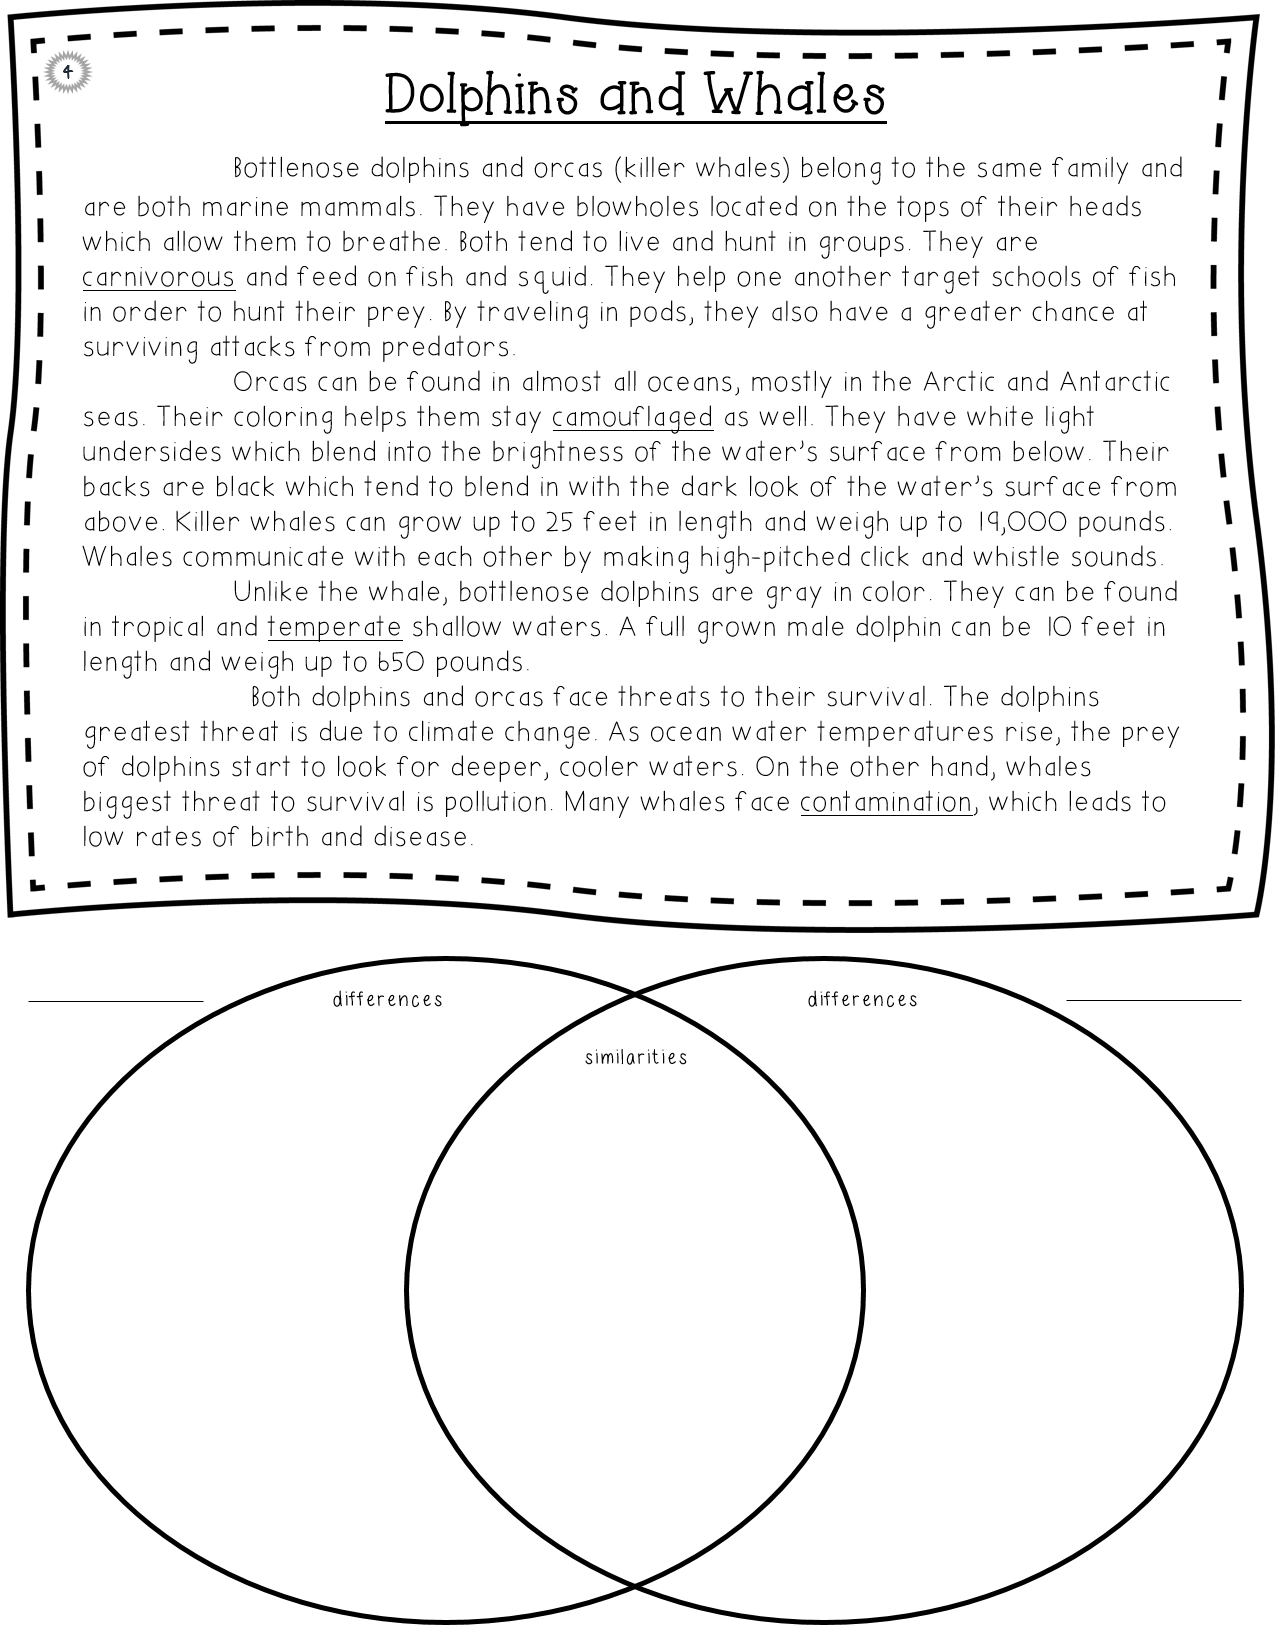 informational text diagram